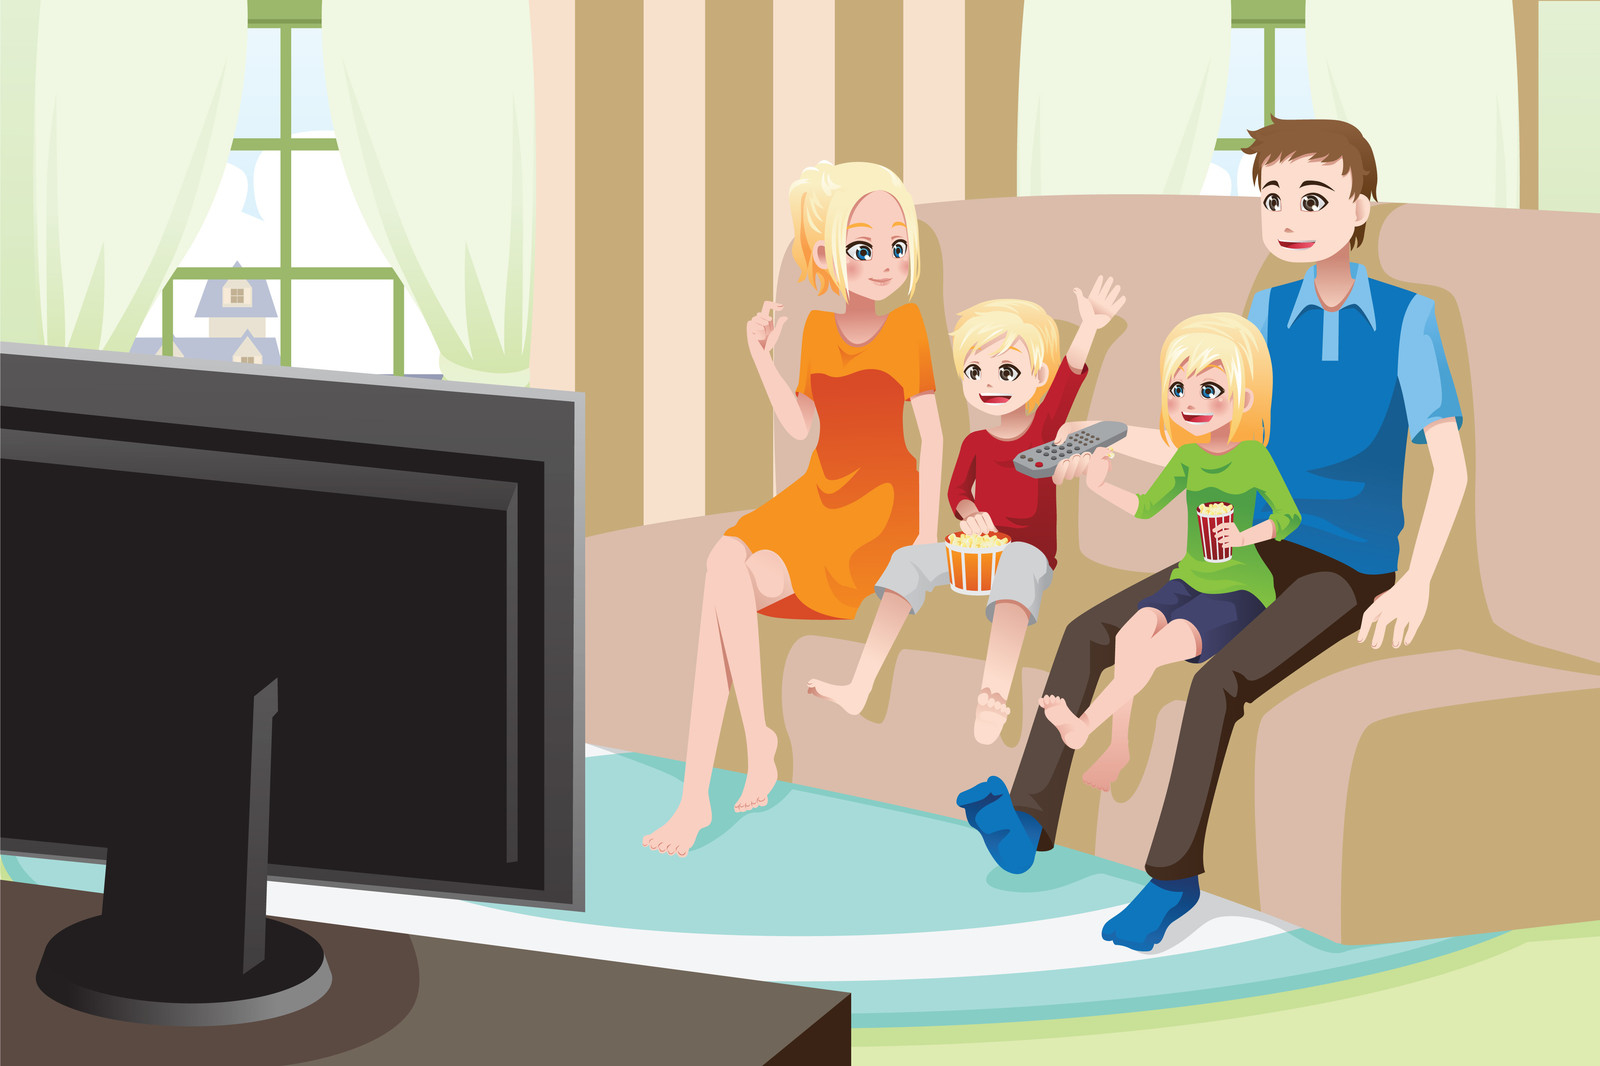 Watching kids watch.